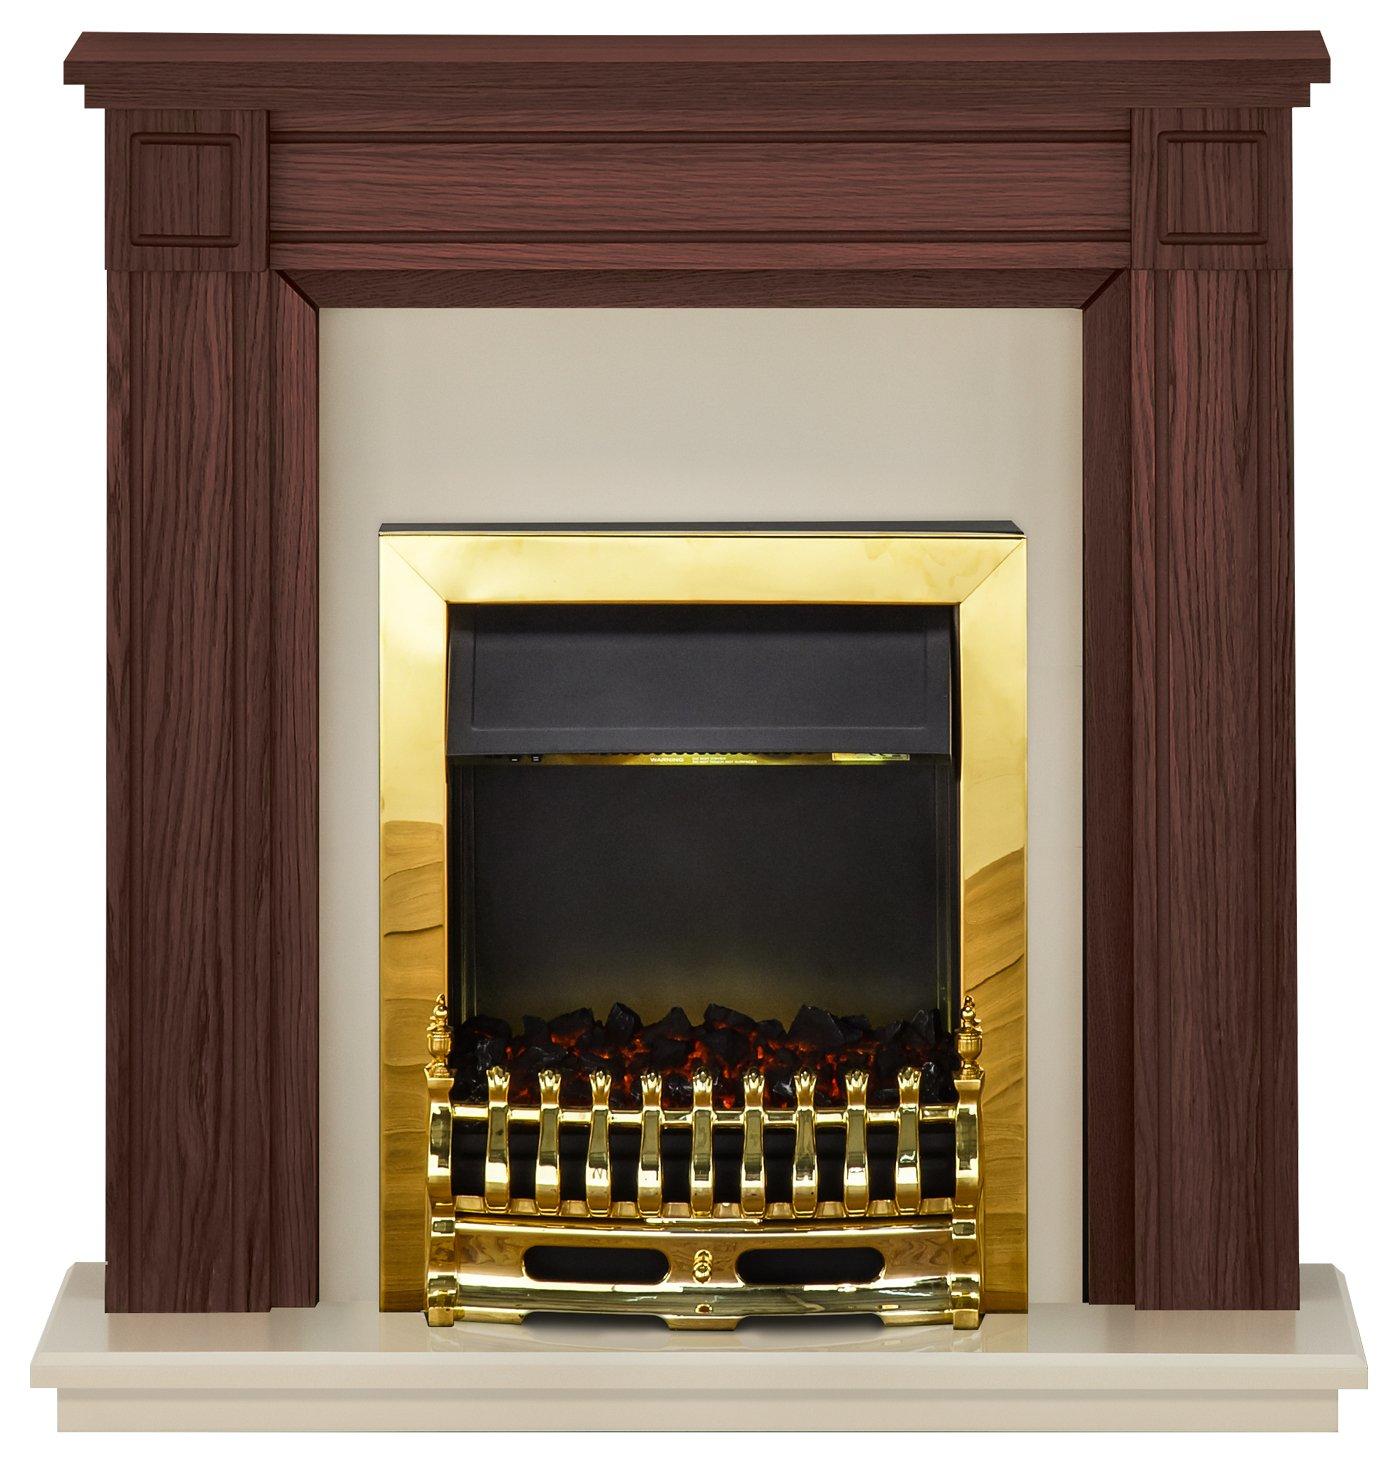 Image of Adam Georgian 2kW Electric Fireplace Suite Mahogany & Cream